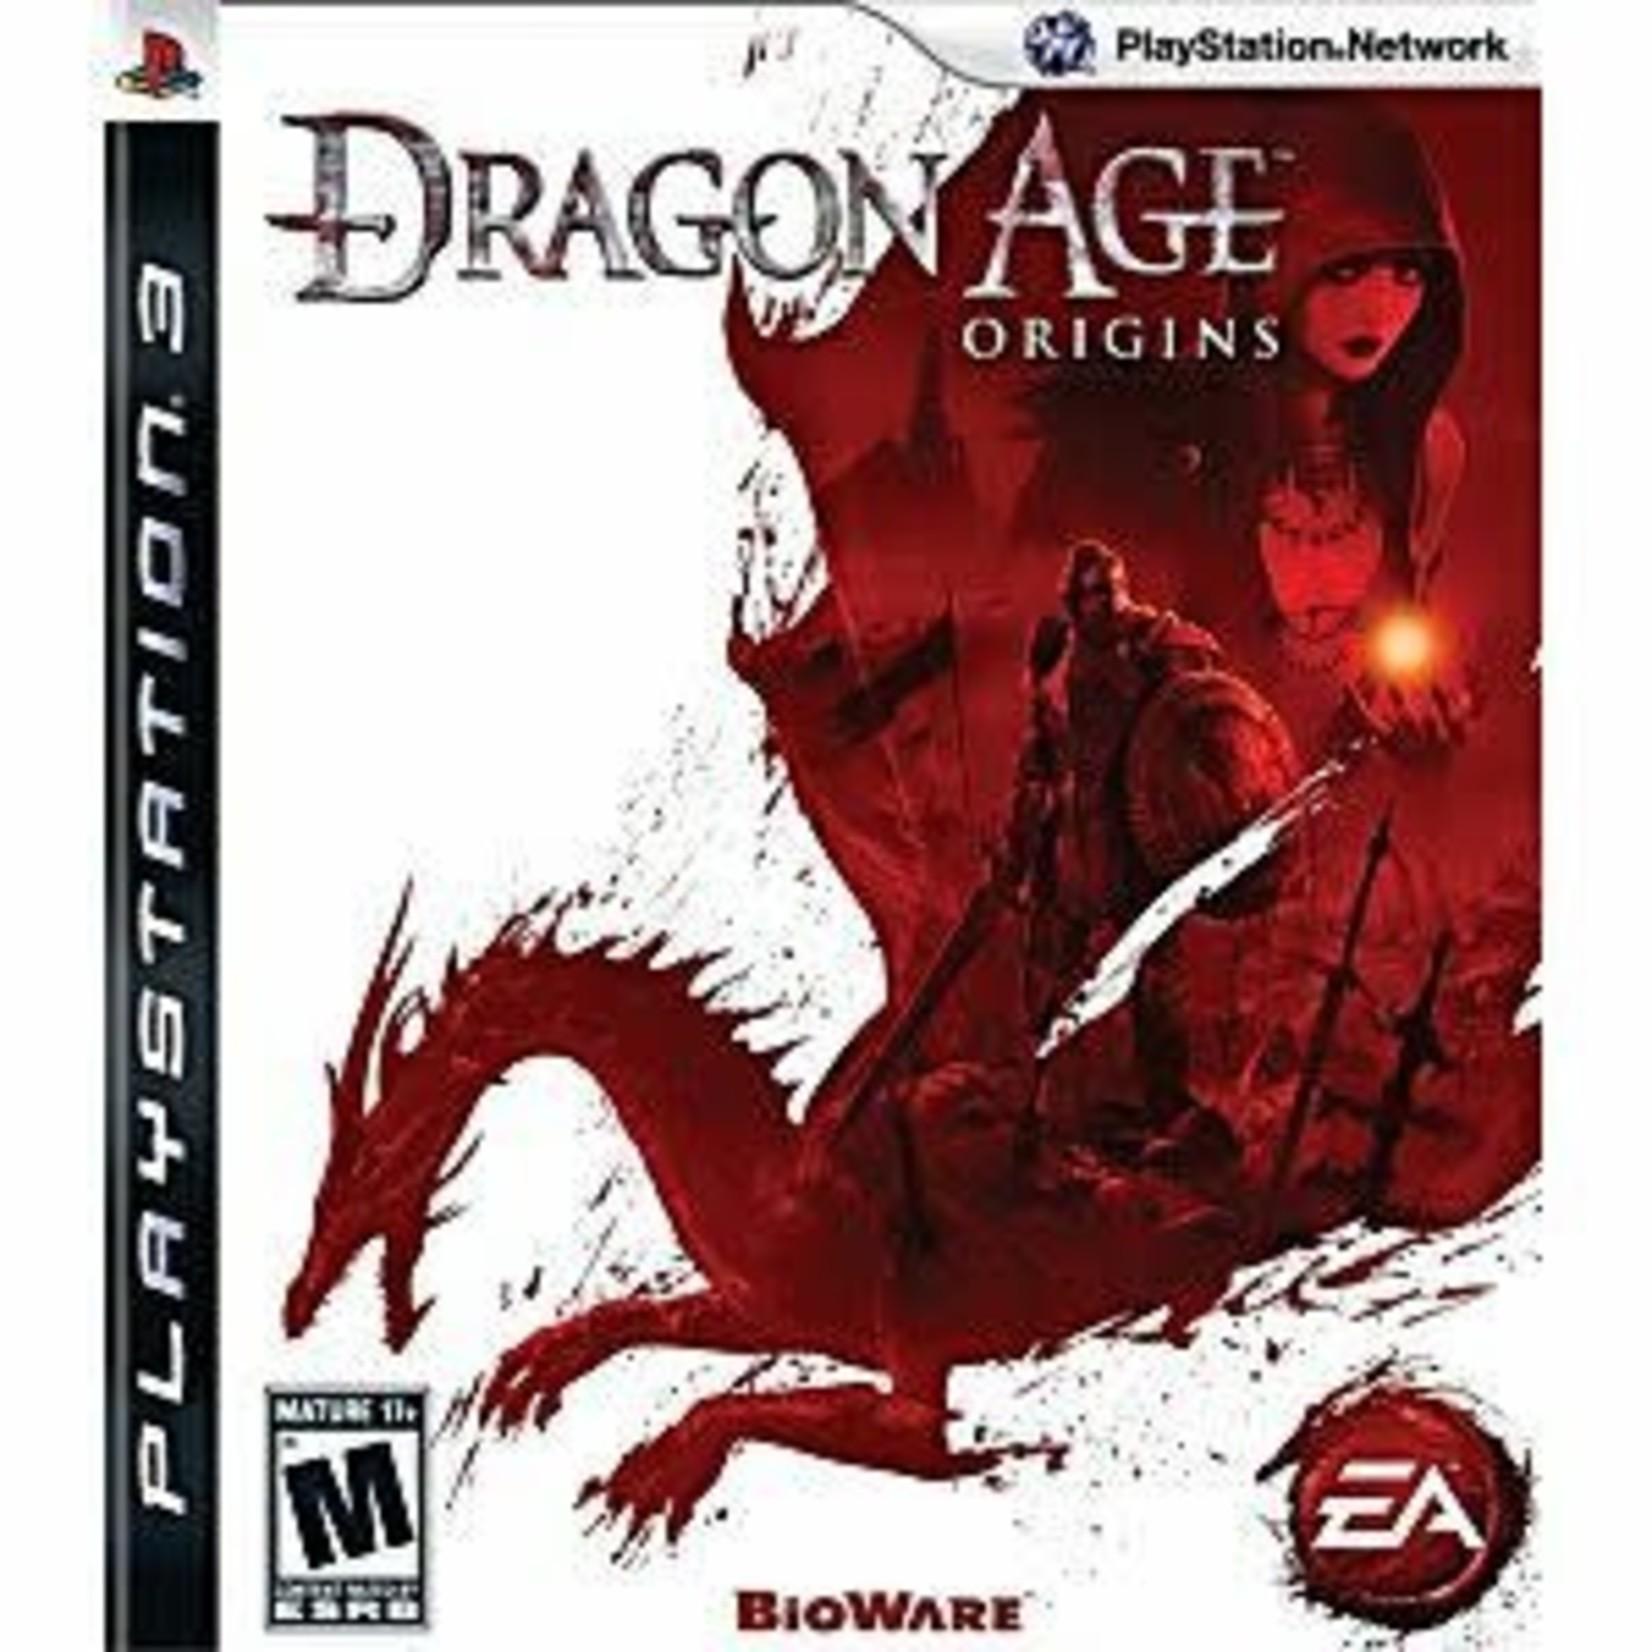 PS3U-Dragon Age: Origins